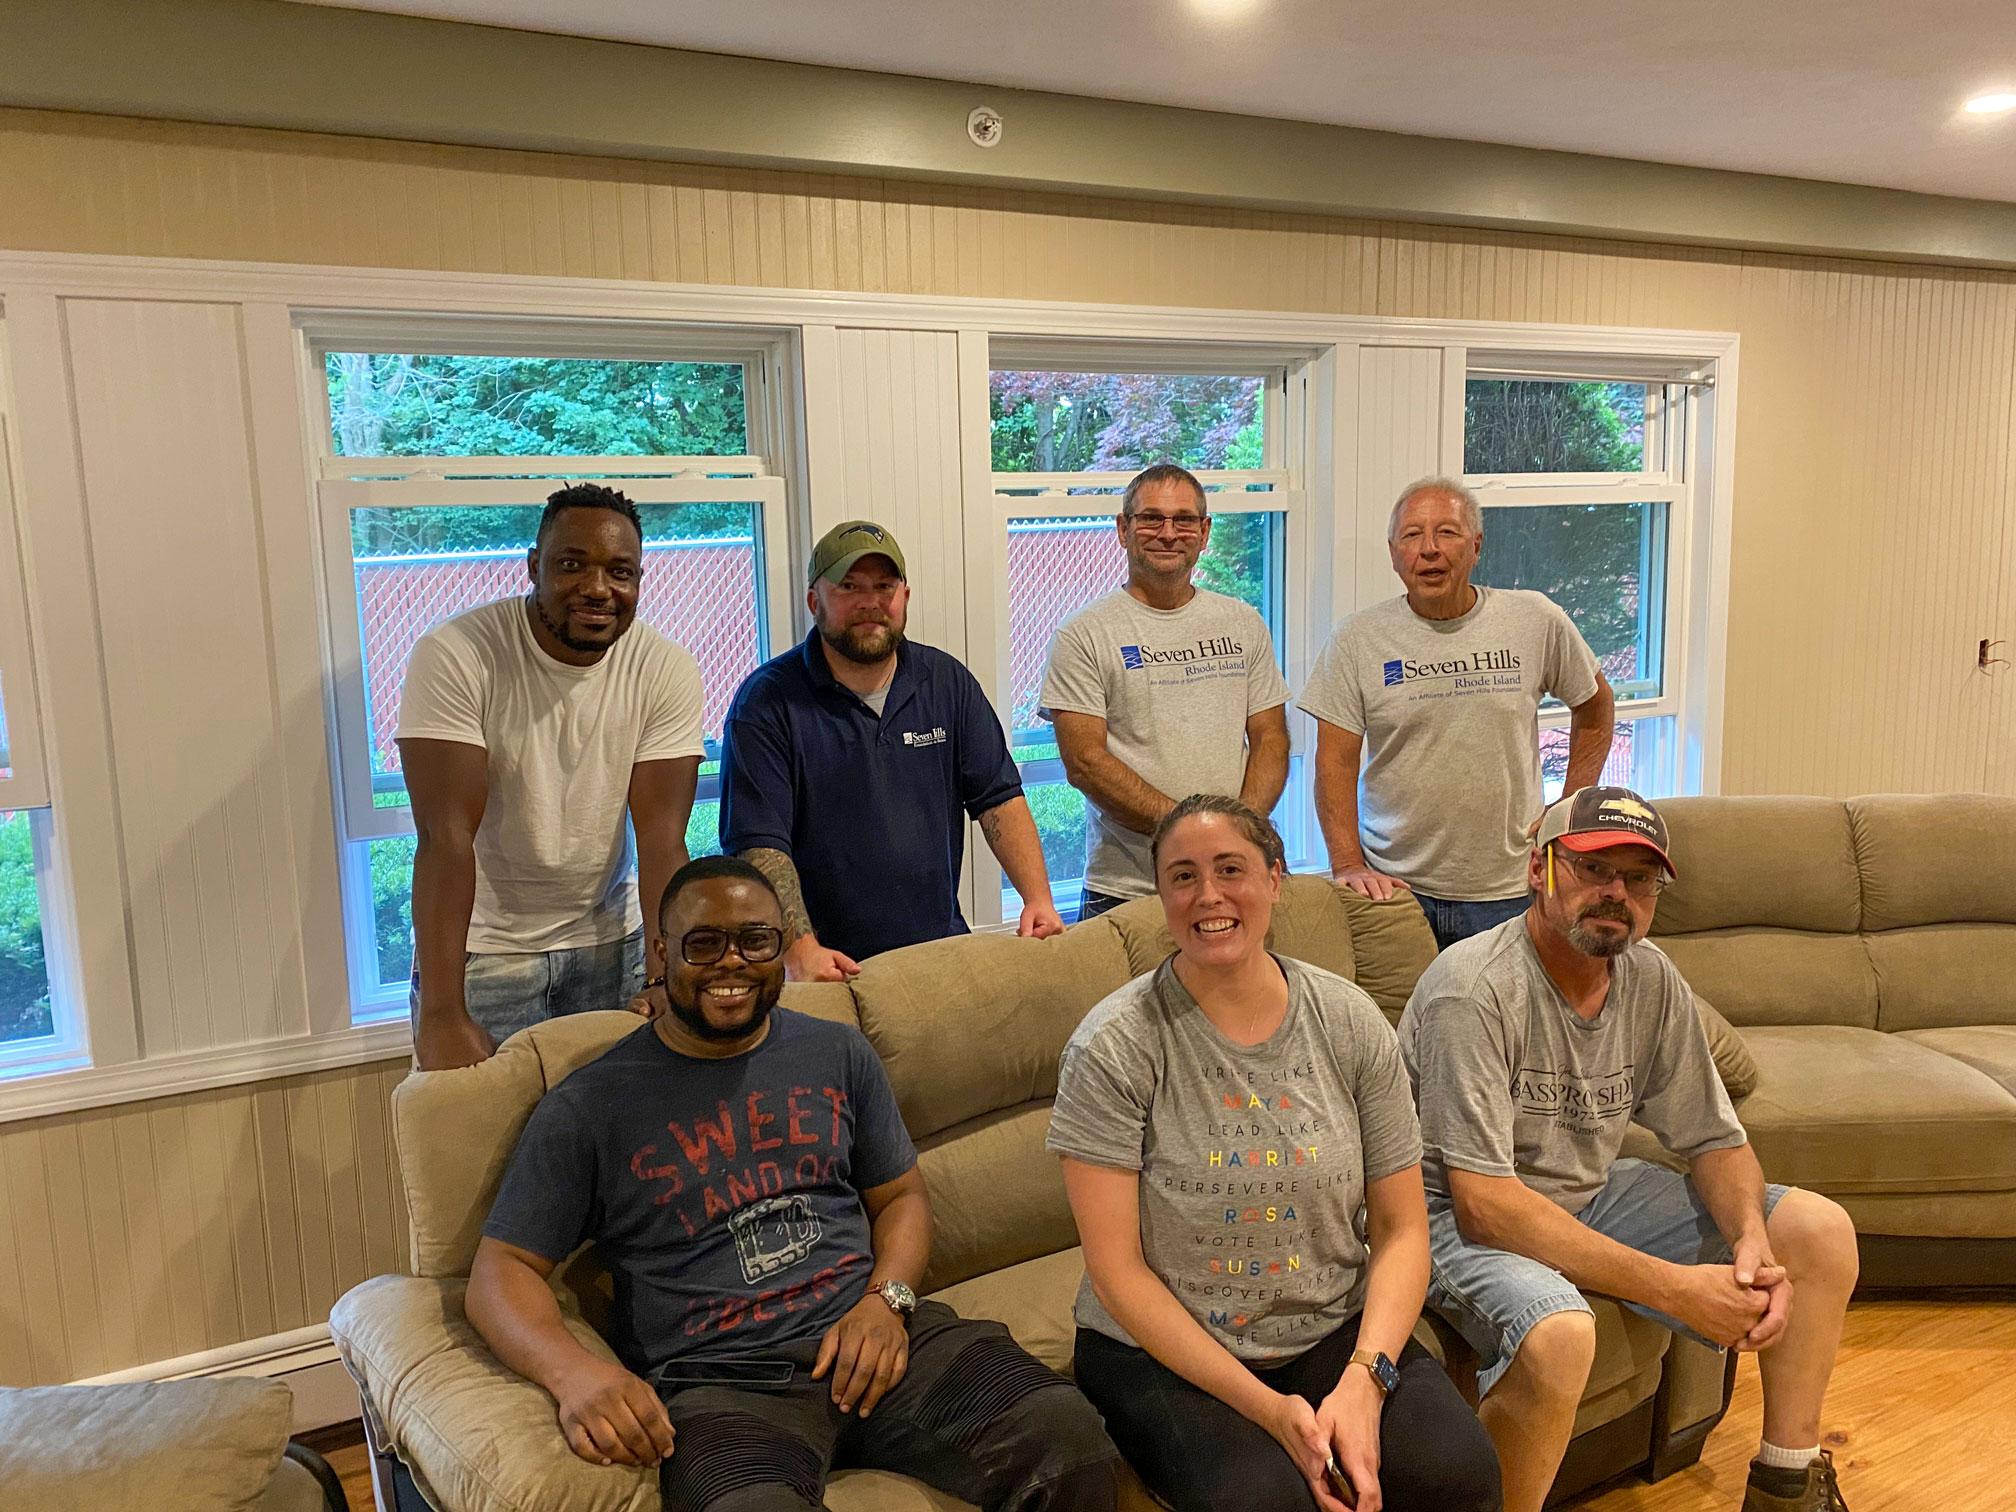 Seven Hills Rhode Island Staff Accomplishment Will Motivate & Inspire!